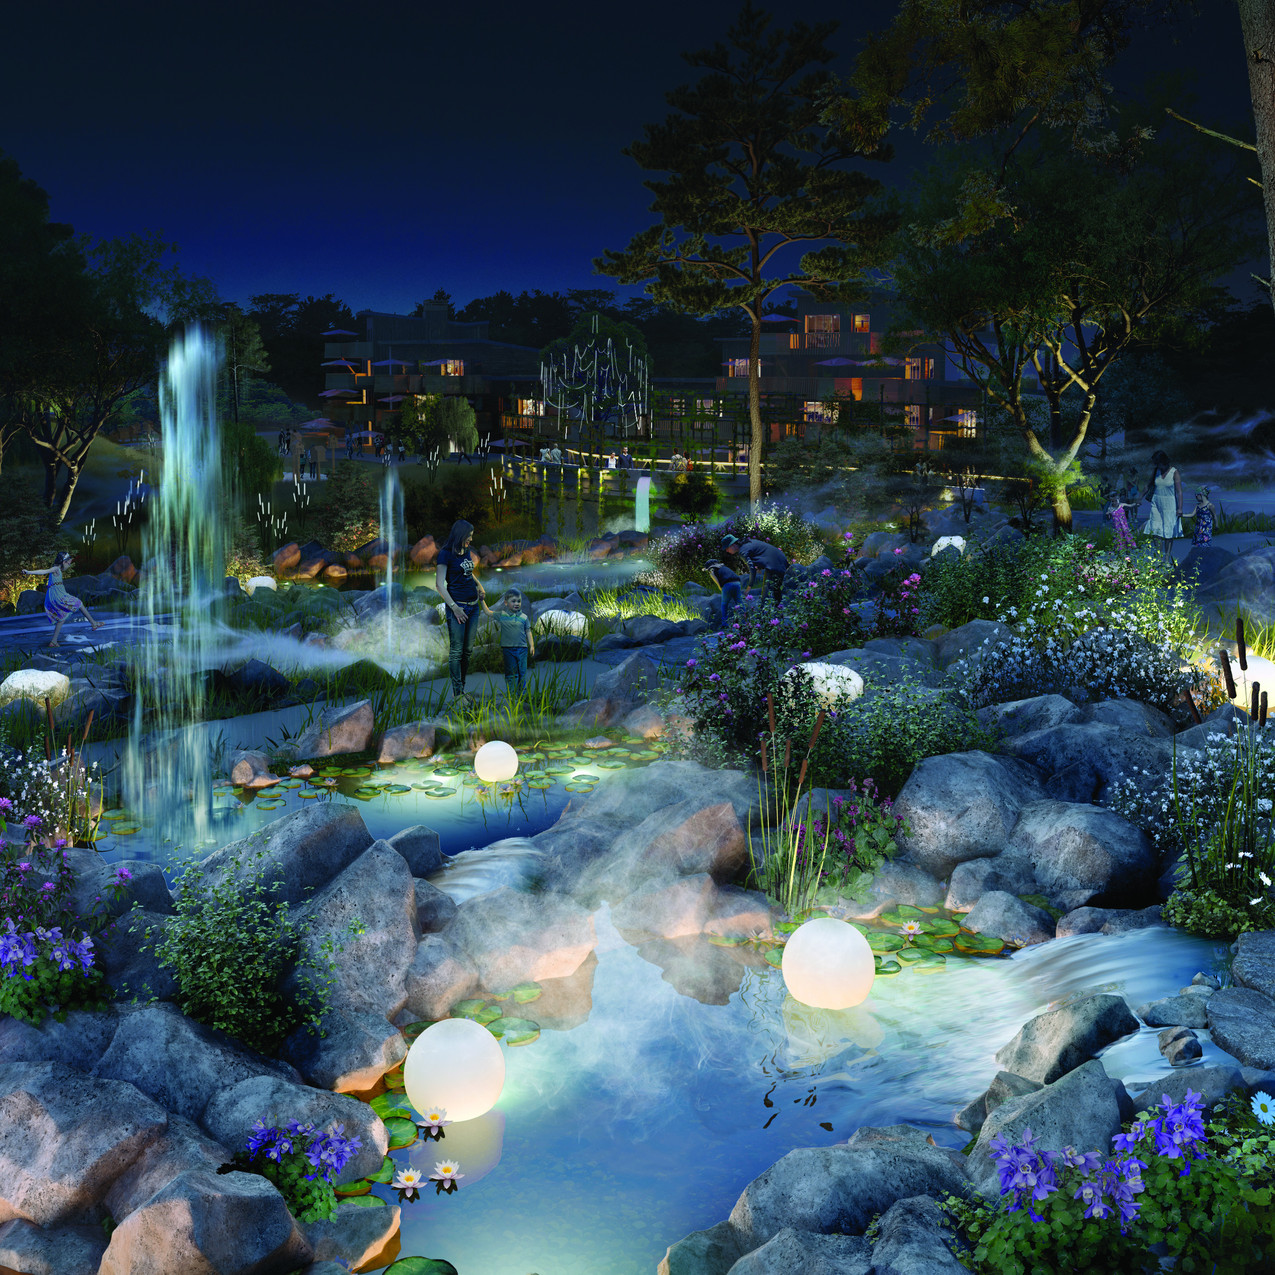 Les Jardins extraordinaires_nuit